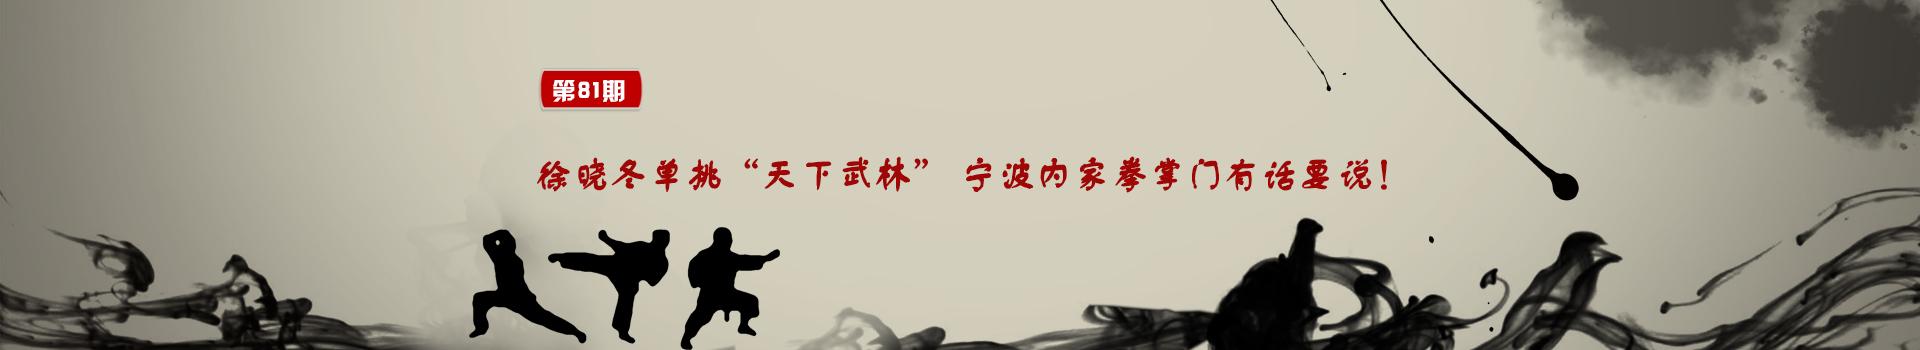 No.81三哥演义